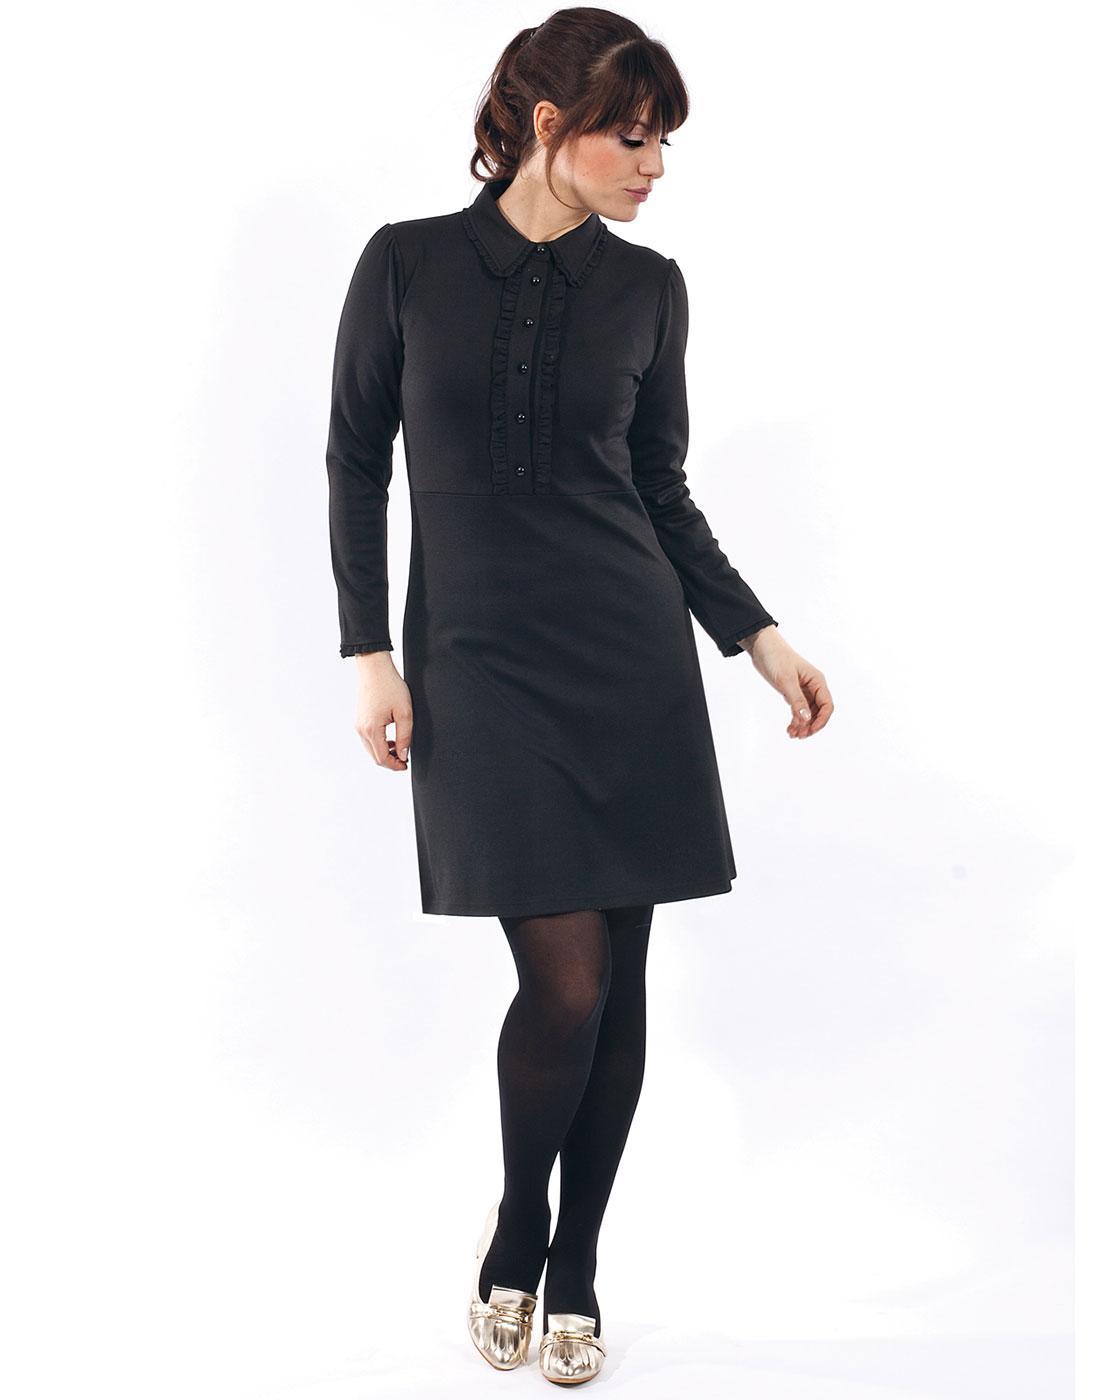 Rebecca MADEMOISELLE YEYE Retro 60s Mod Polo Dress